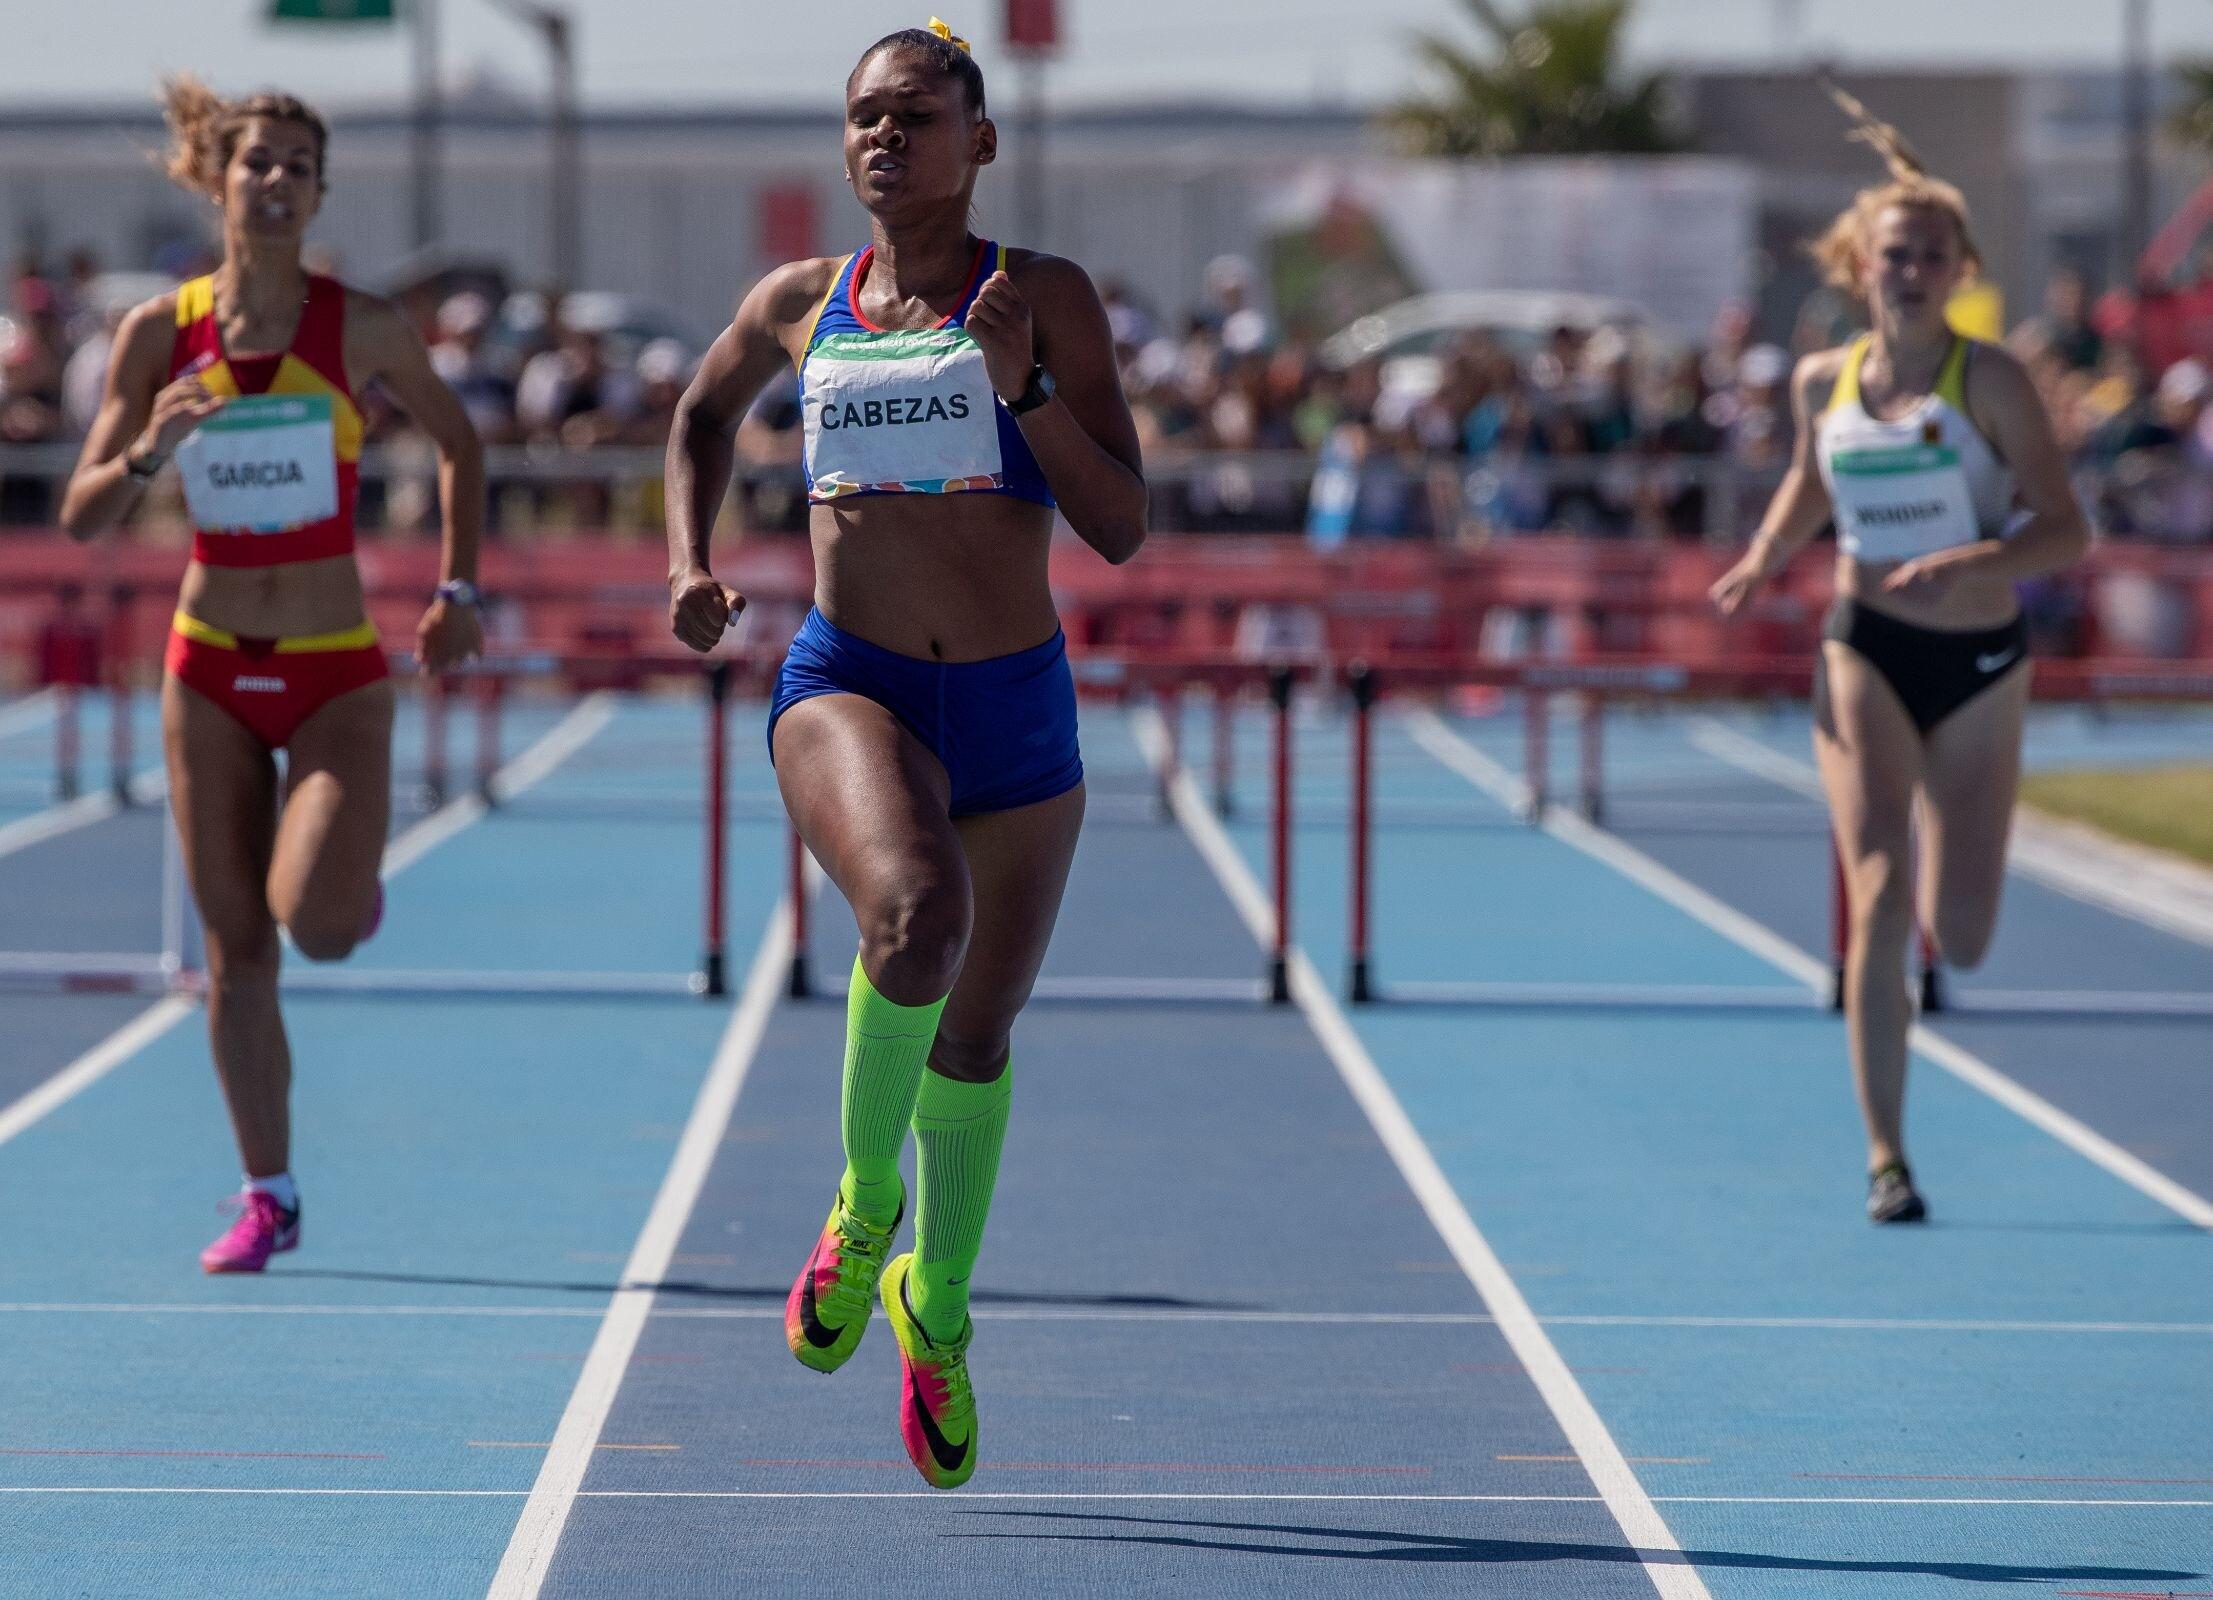 Buenos Aires 2018 - Athlétisme - 400 m haies femmes